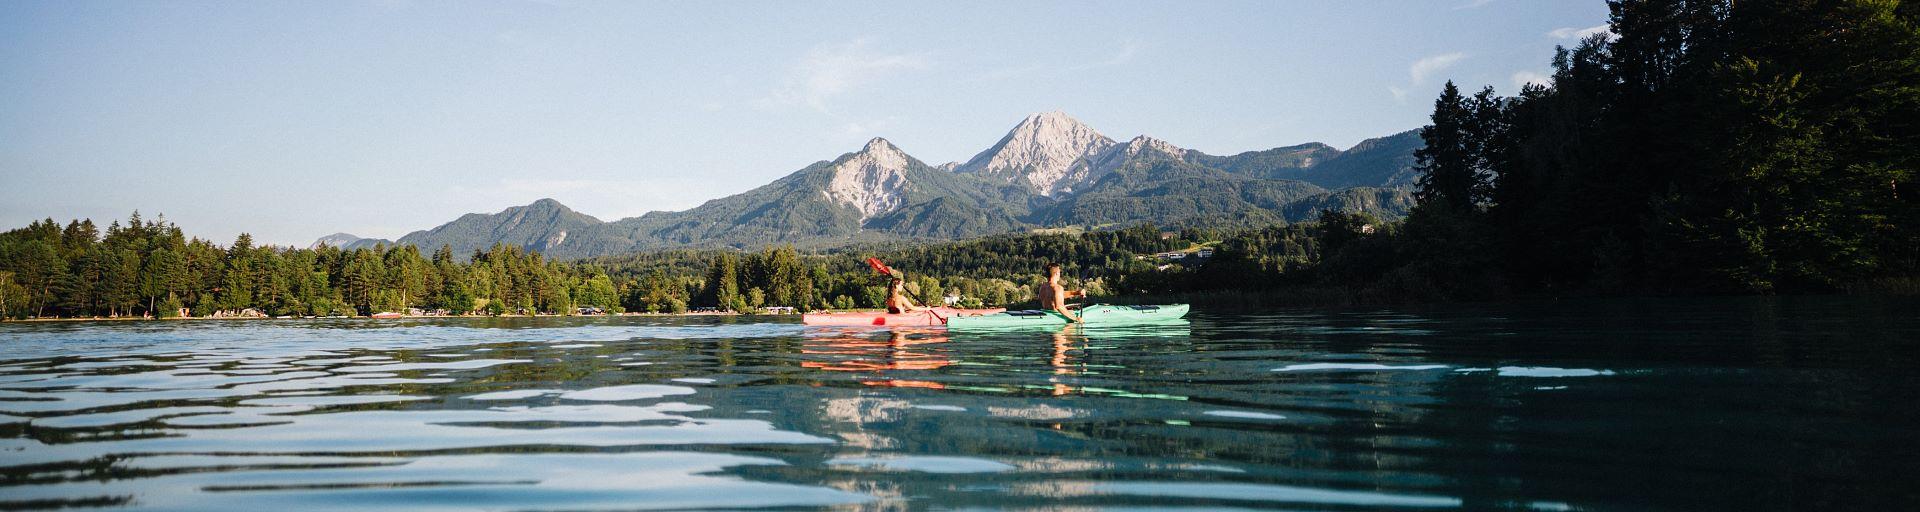 Esatet 2021 sui laghi di Villach